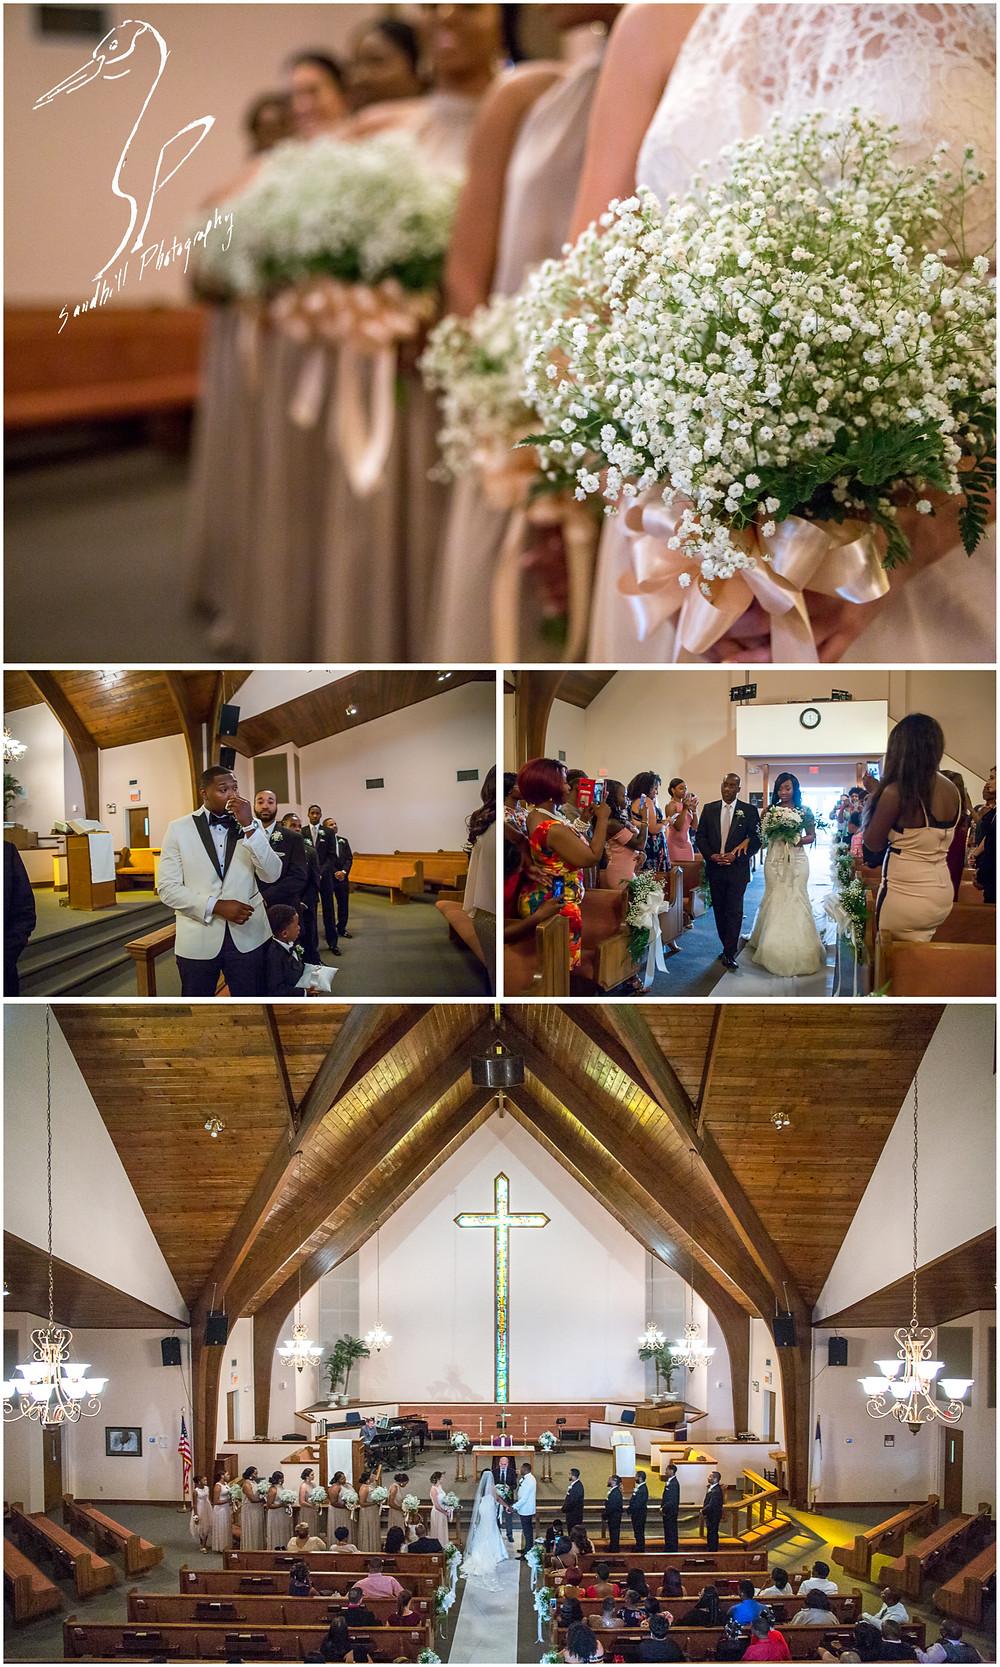 Bradenton Wedding Photographer, wedding ceremony at United First Methodist Church of Seffner